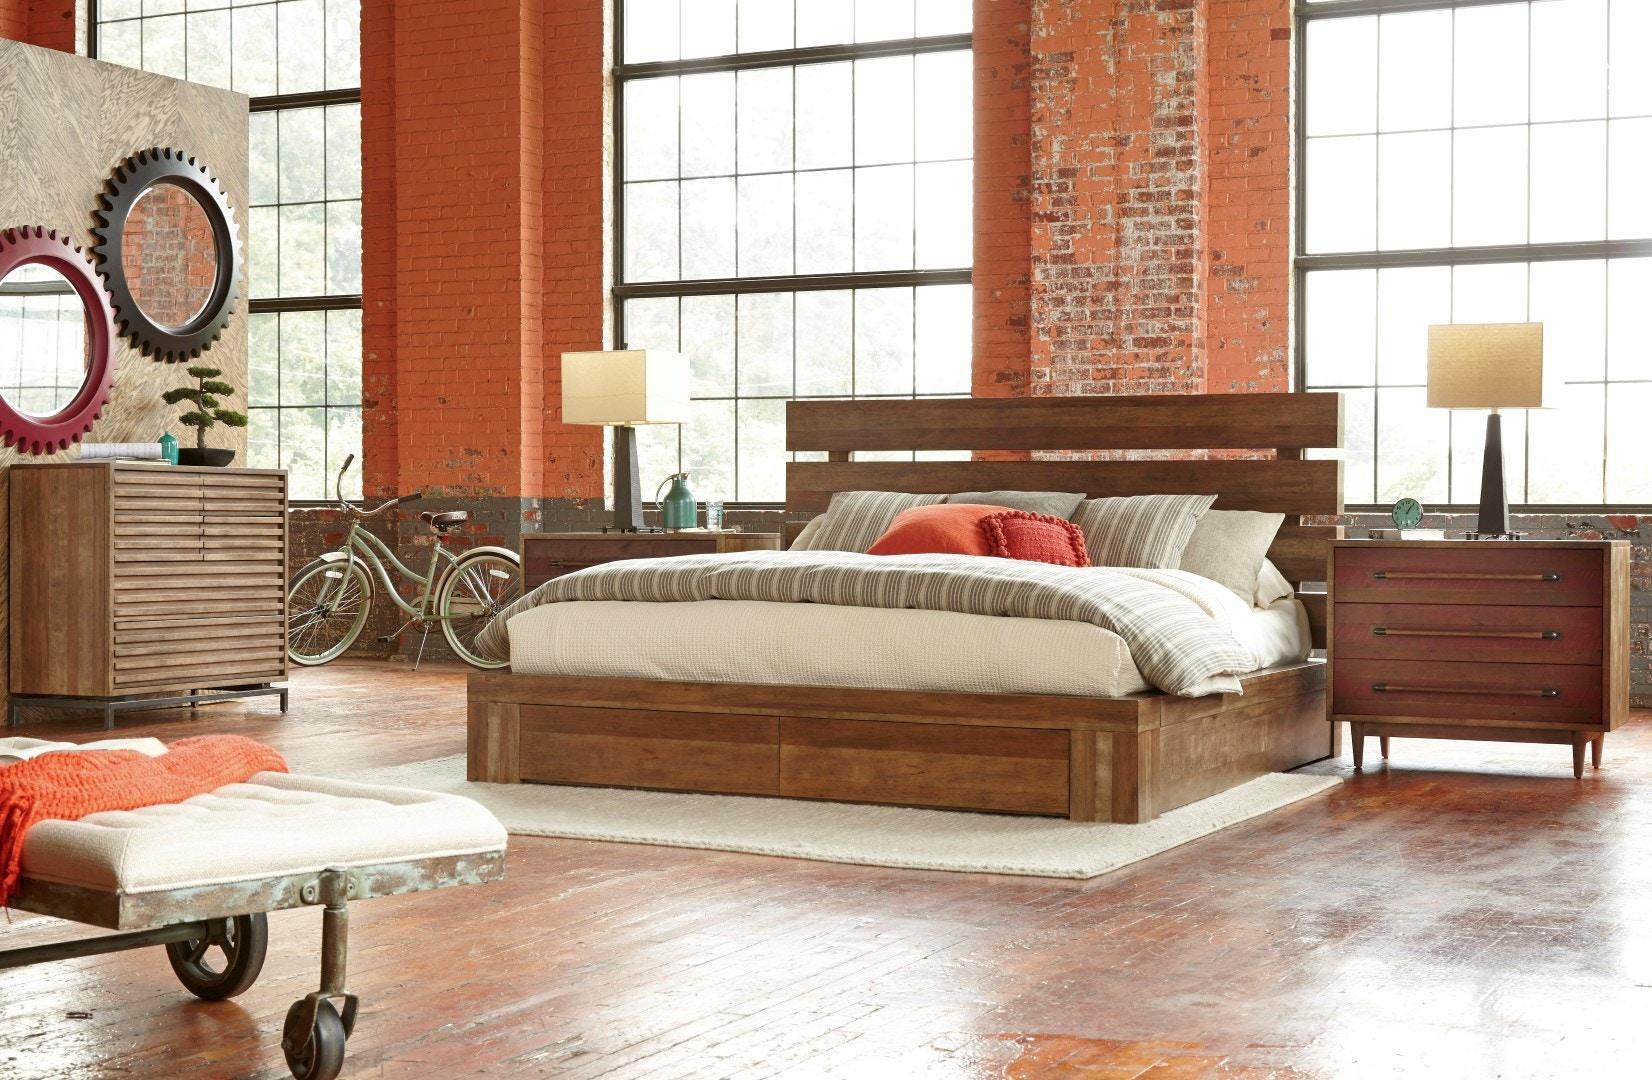 Delicieux WES 5/0 Franklin Street Complete Platform Bed WKP252302 From Walter E. Smithe  Furniture